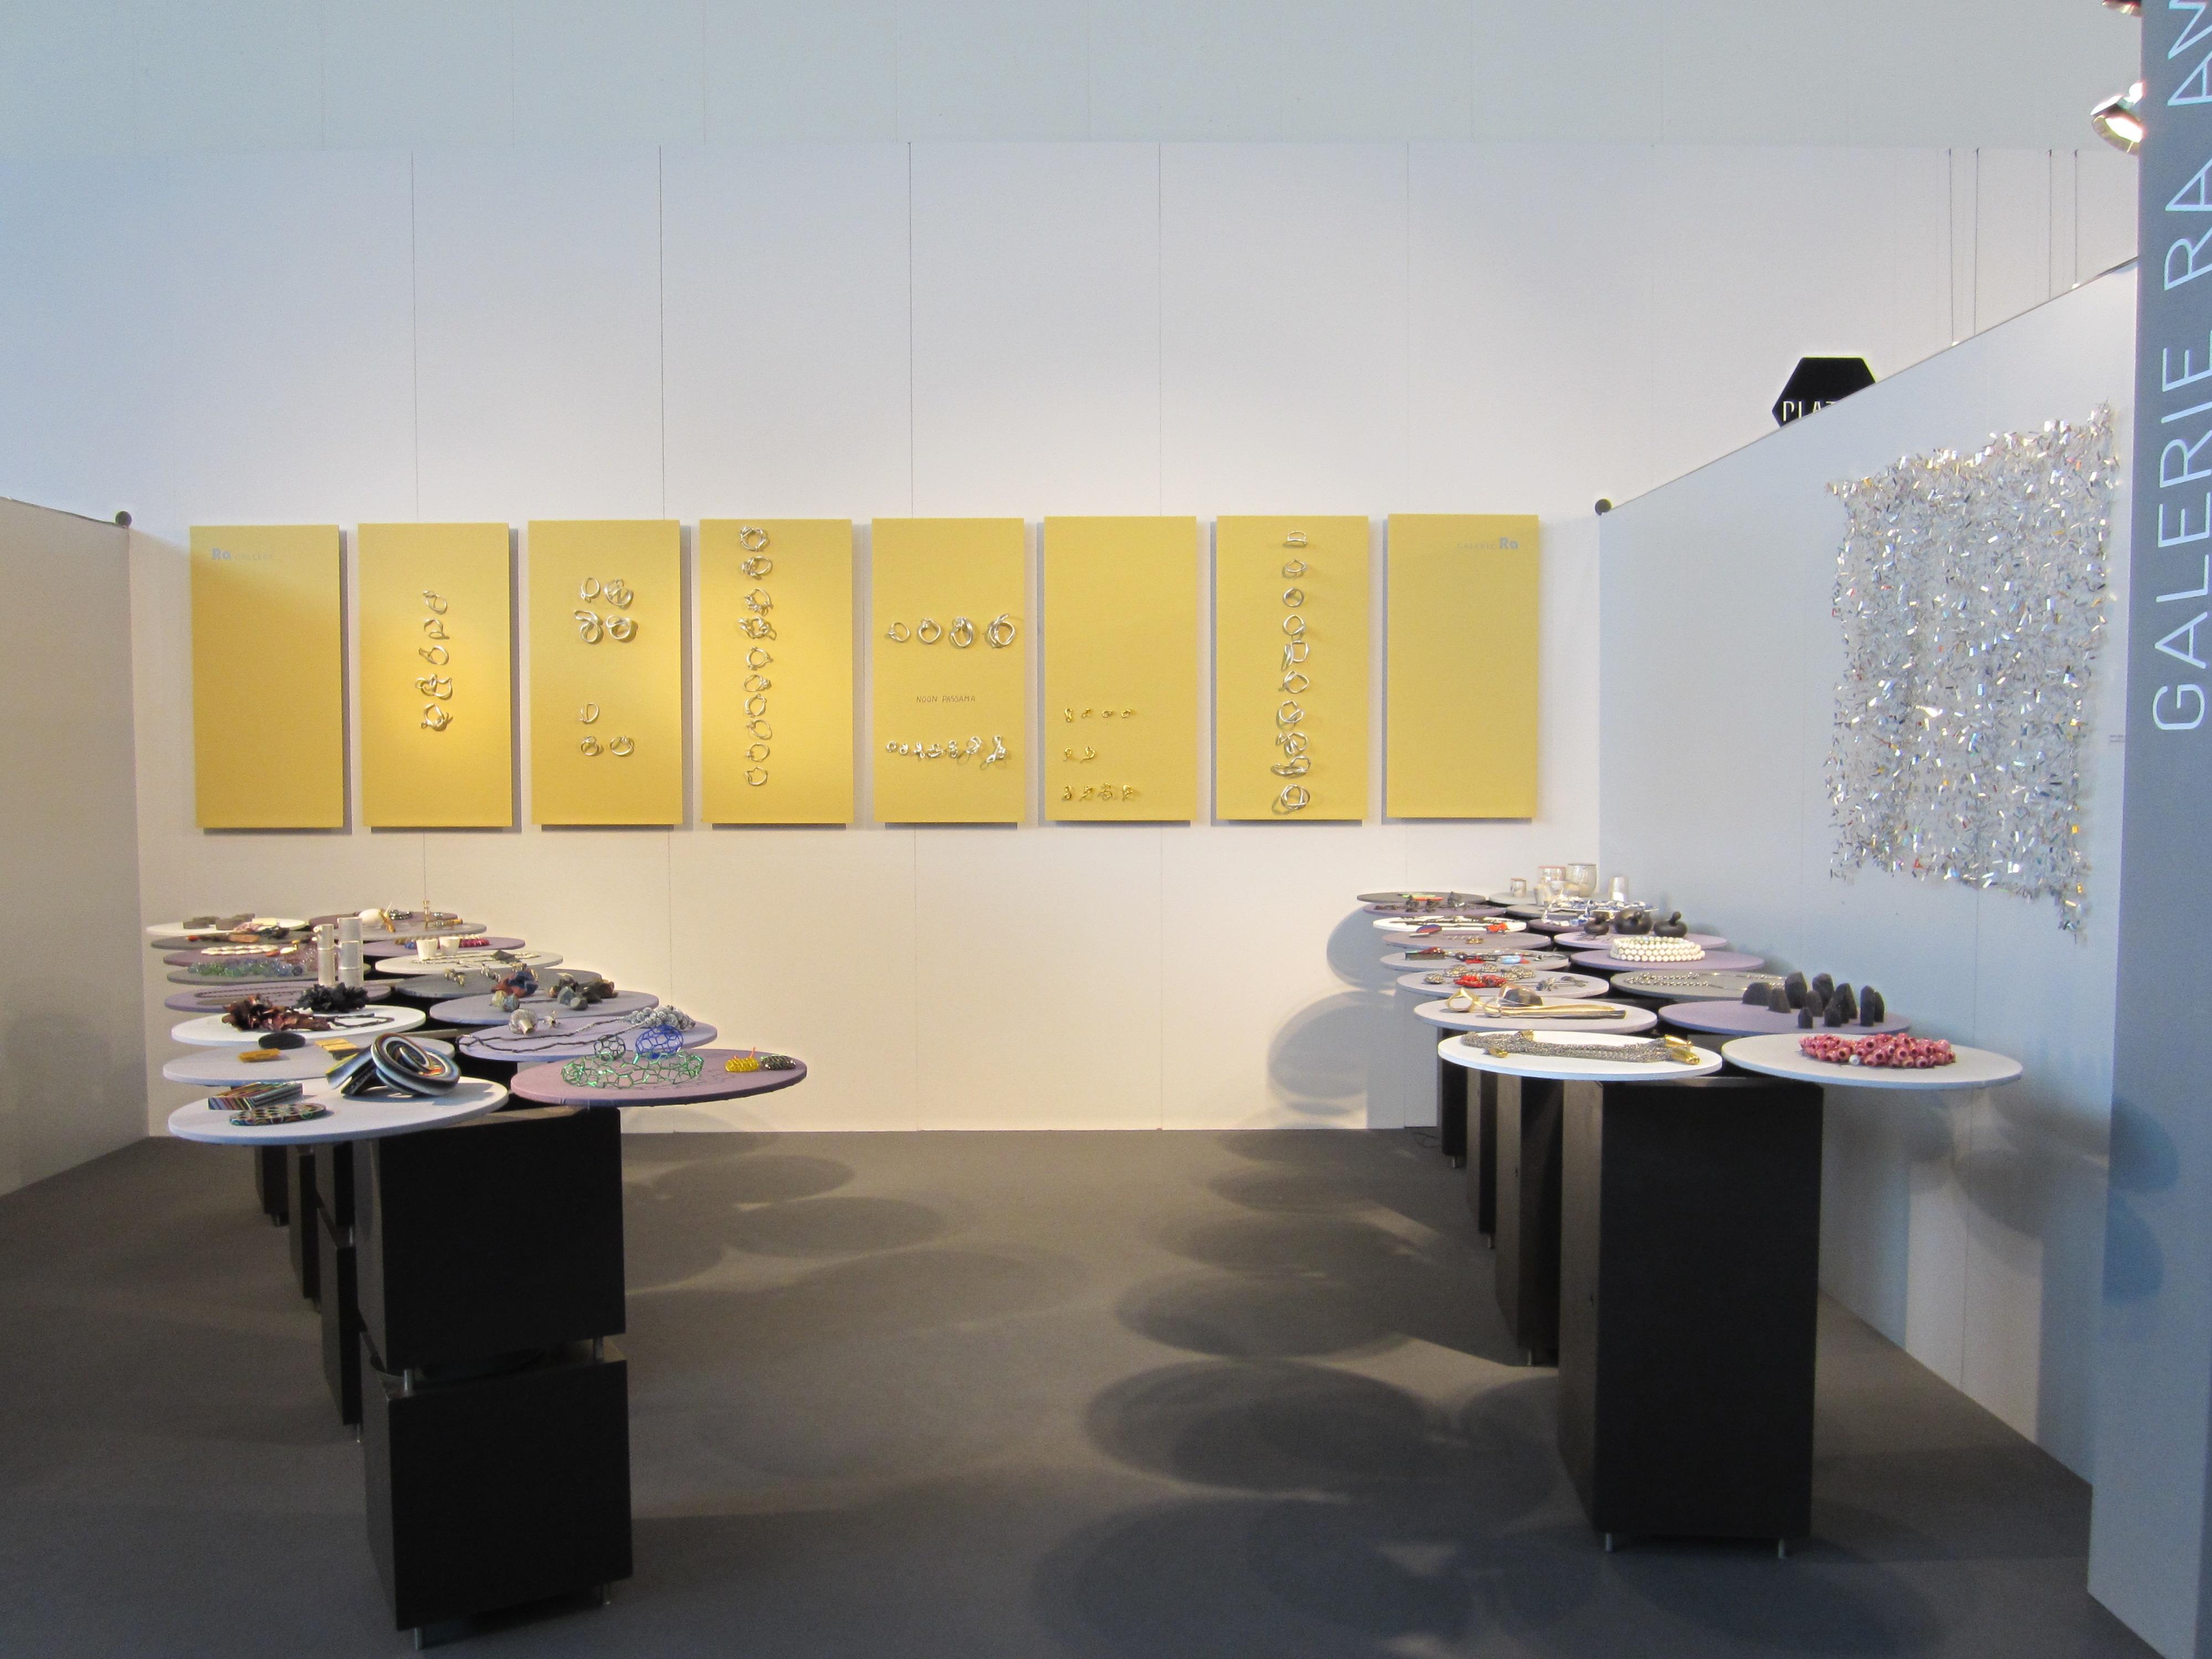 Galerie Ra op Frame, München, 2016